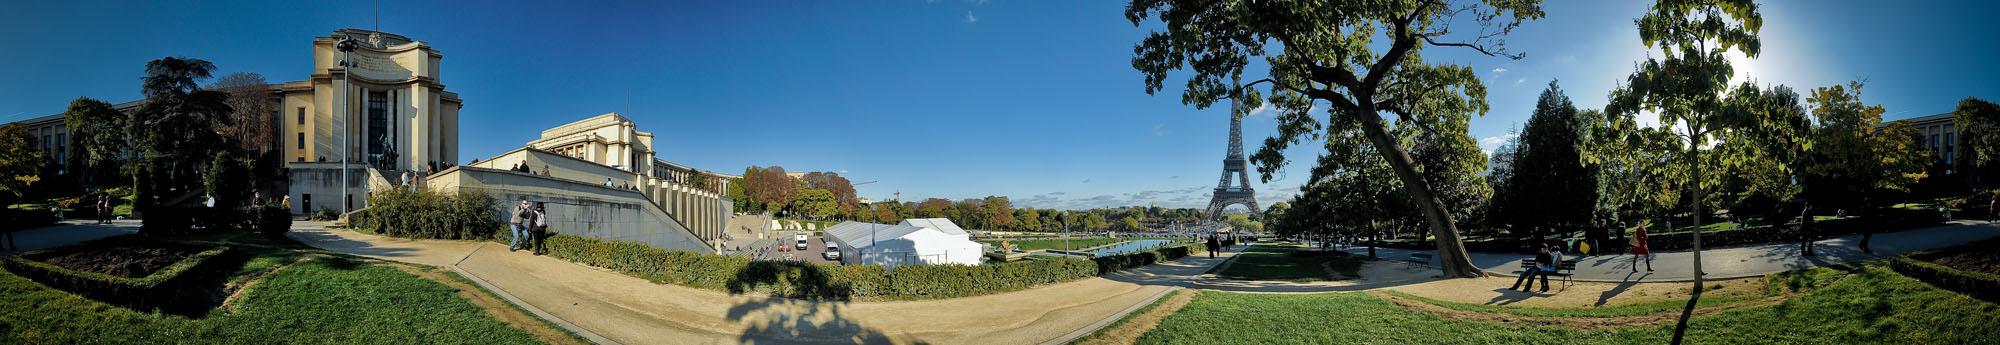 Trocadero Park Panorama